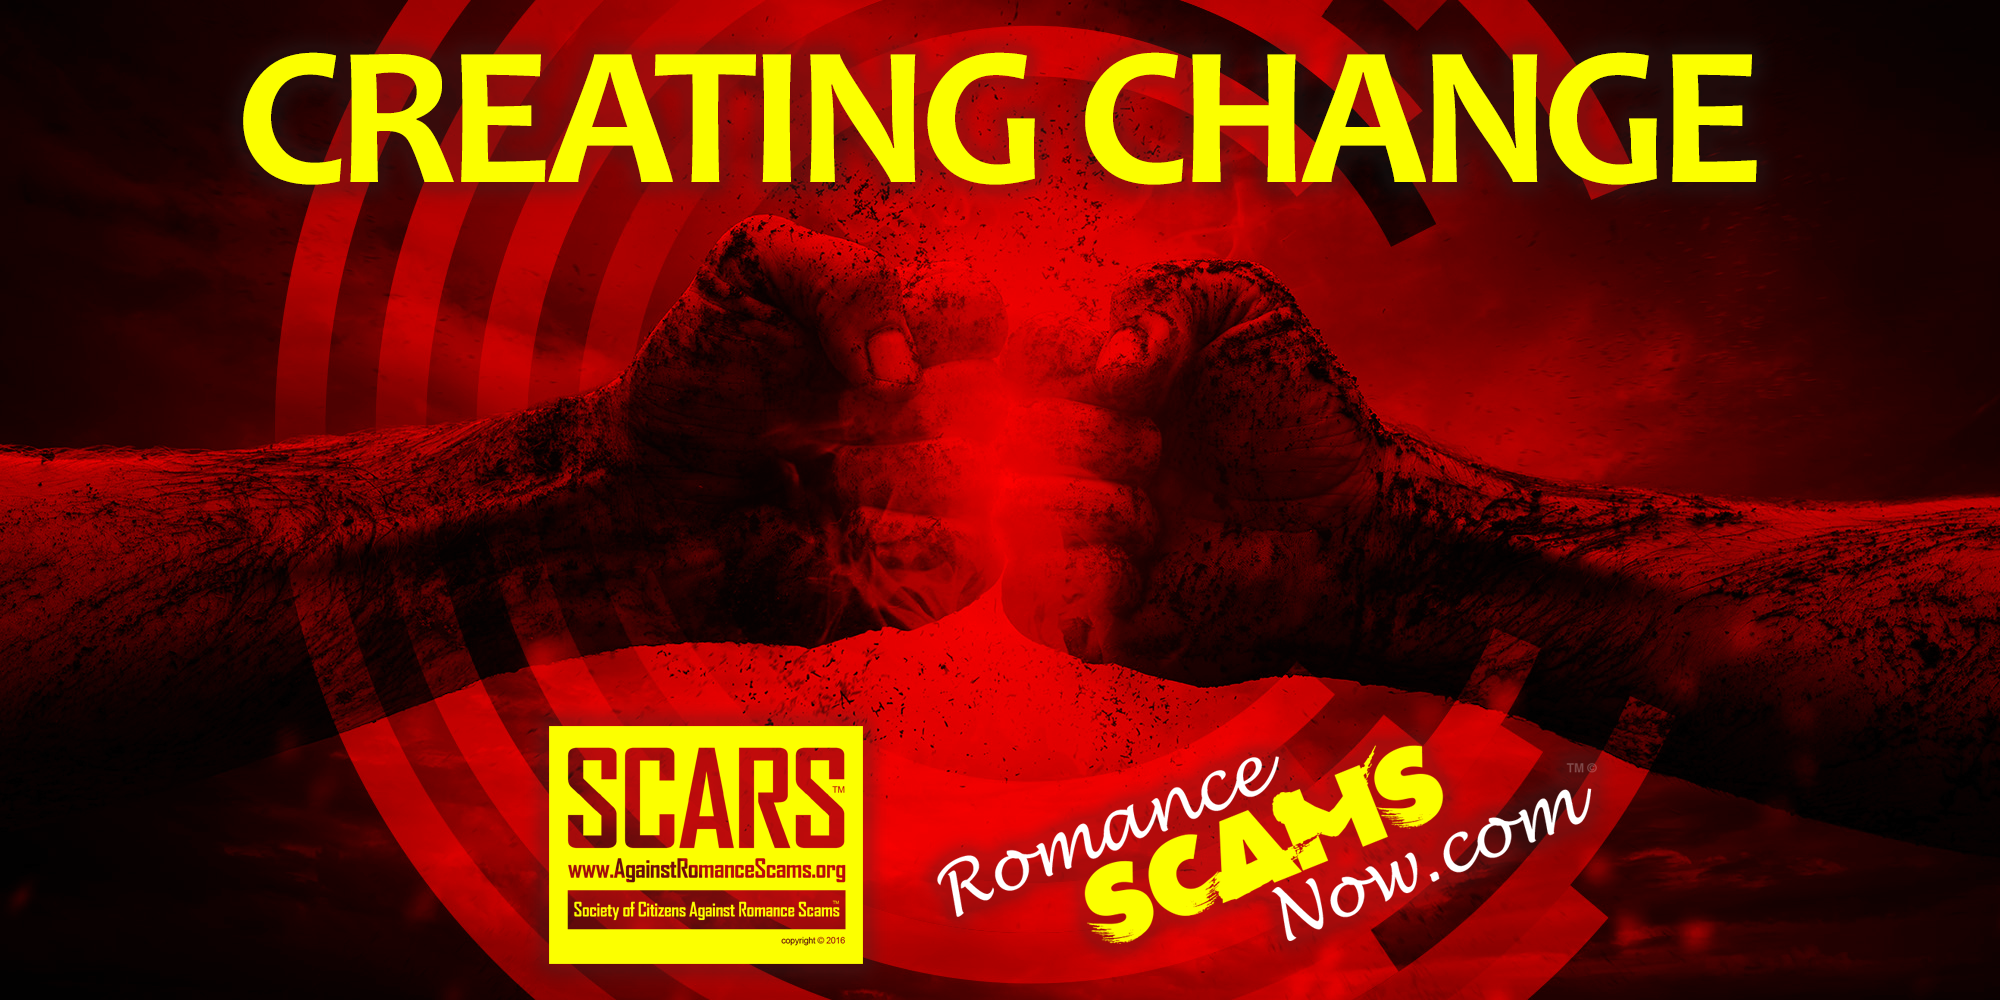 SCARS - CREATING CHANGE